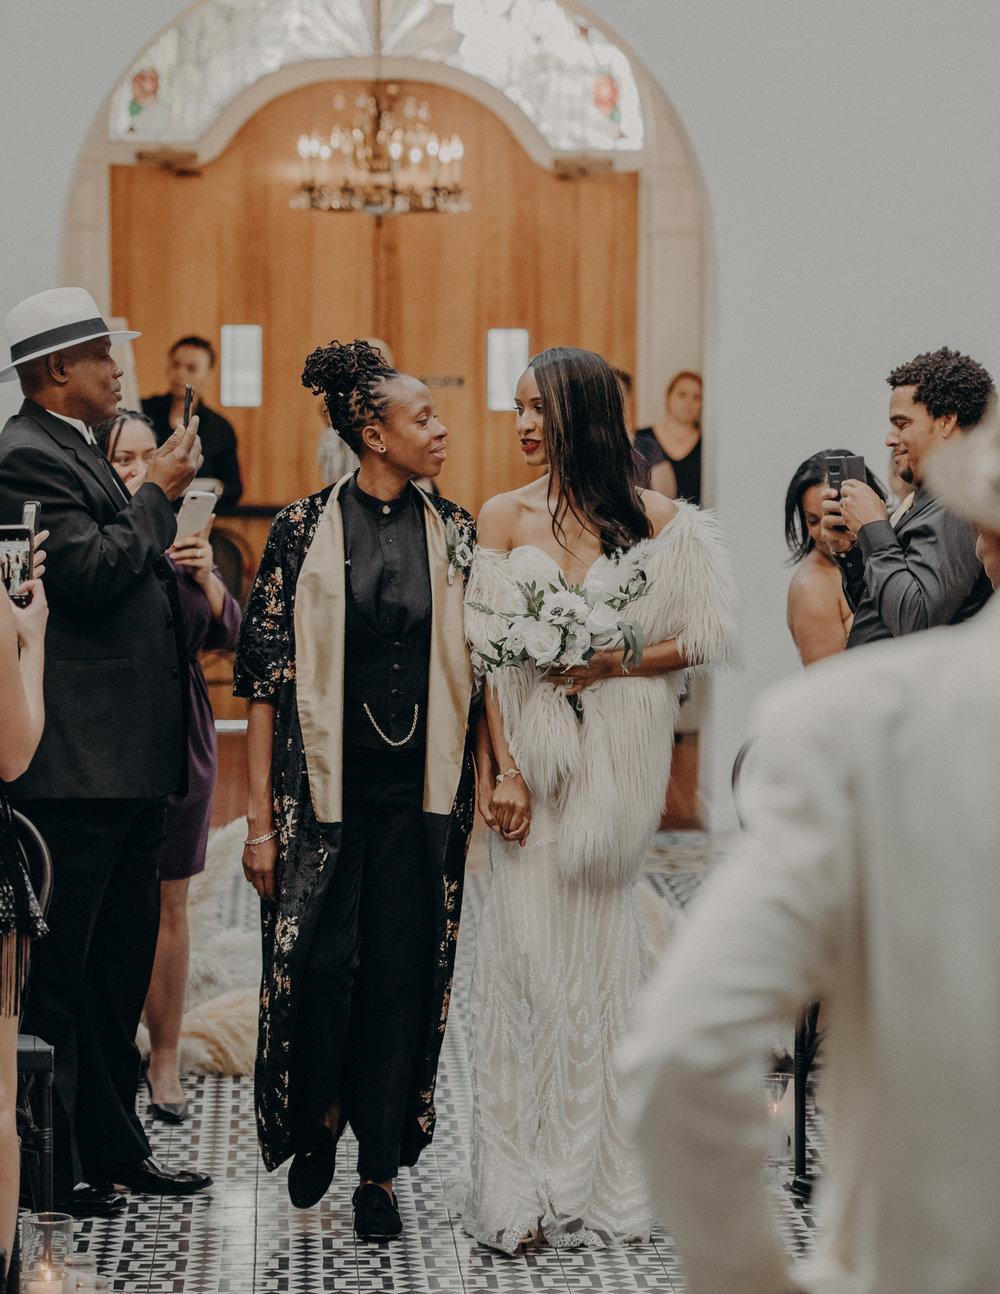 Wedding Photographer in Los Angeles - Ebell of Long Beach Wedding - LGBTQ weddings - lesbian wedding - IsaiahAndTaylor.com-090.jpg